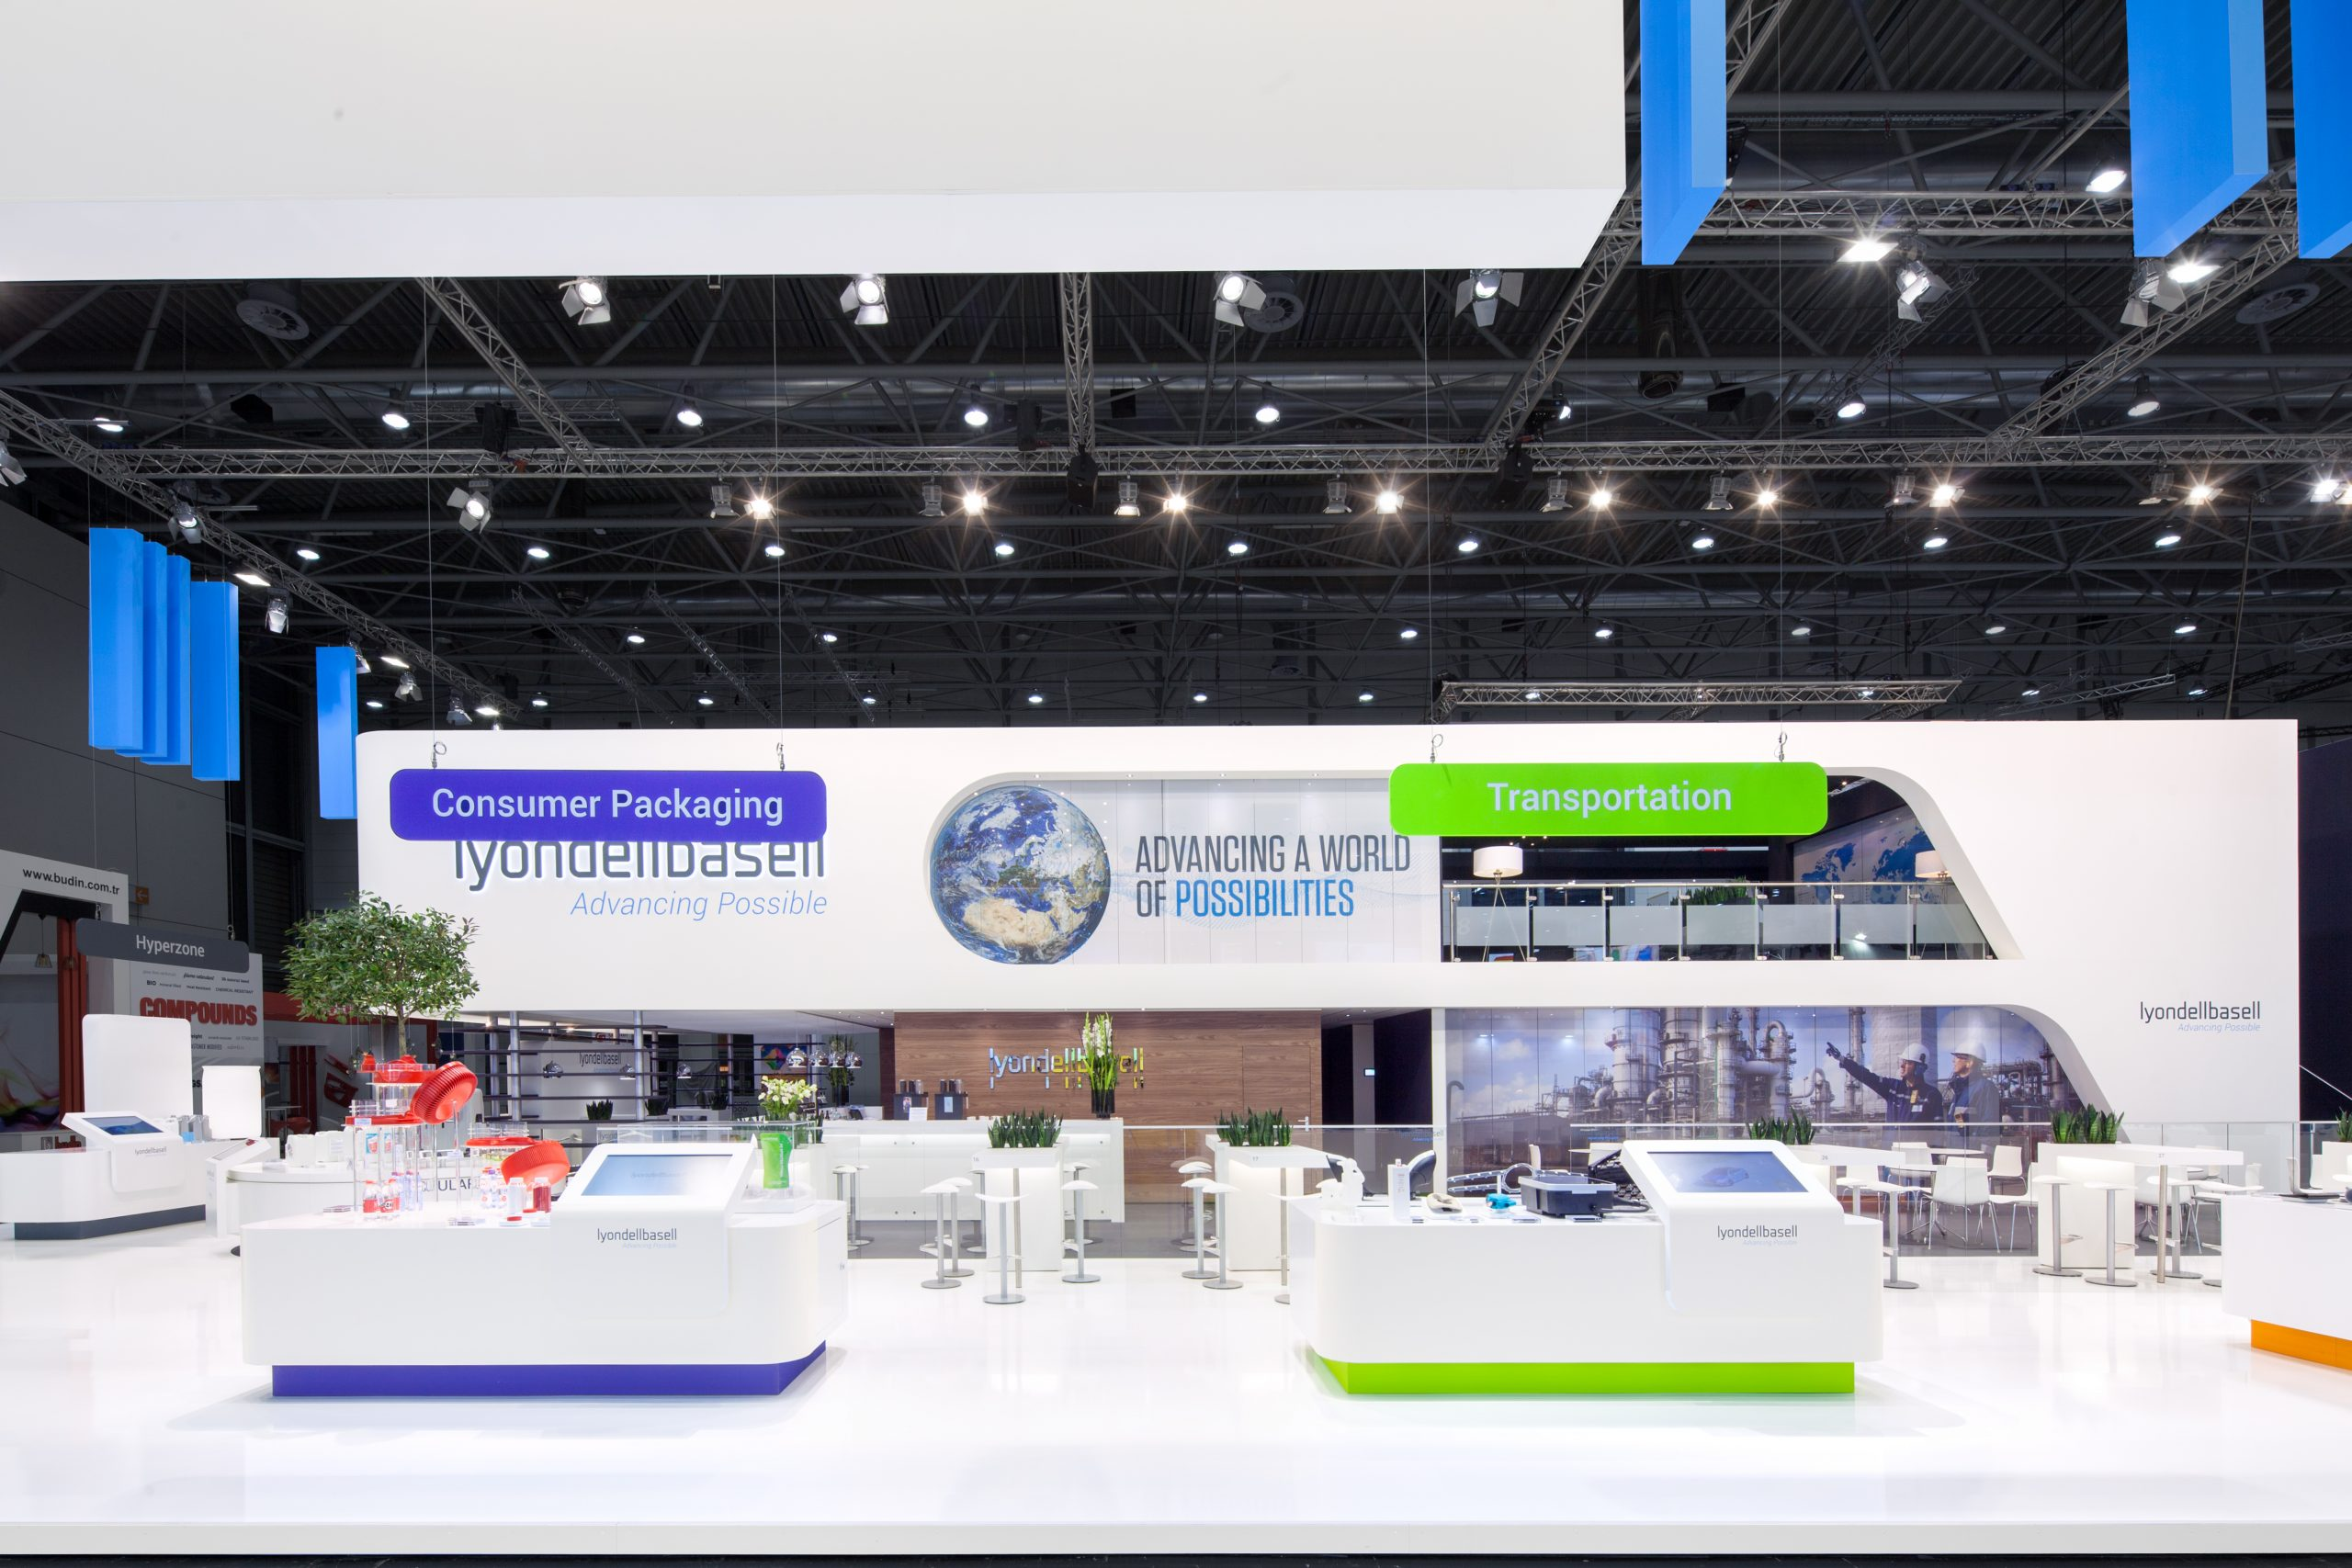 2 CAS Exhibition Partners - Lyondellbasell - K 2019 - Düsseldorf - Standbouwfotografie #9326